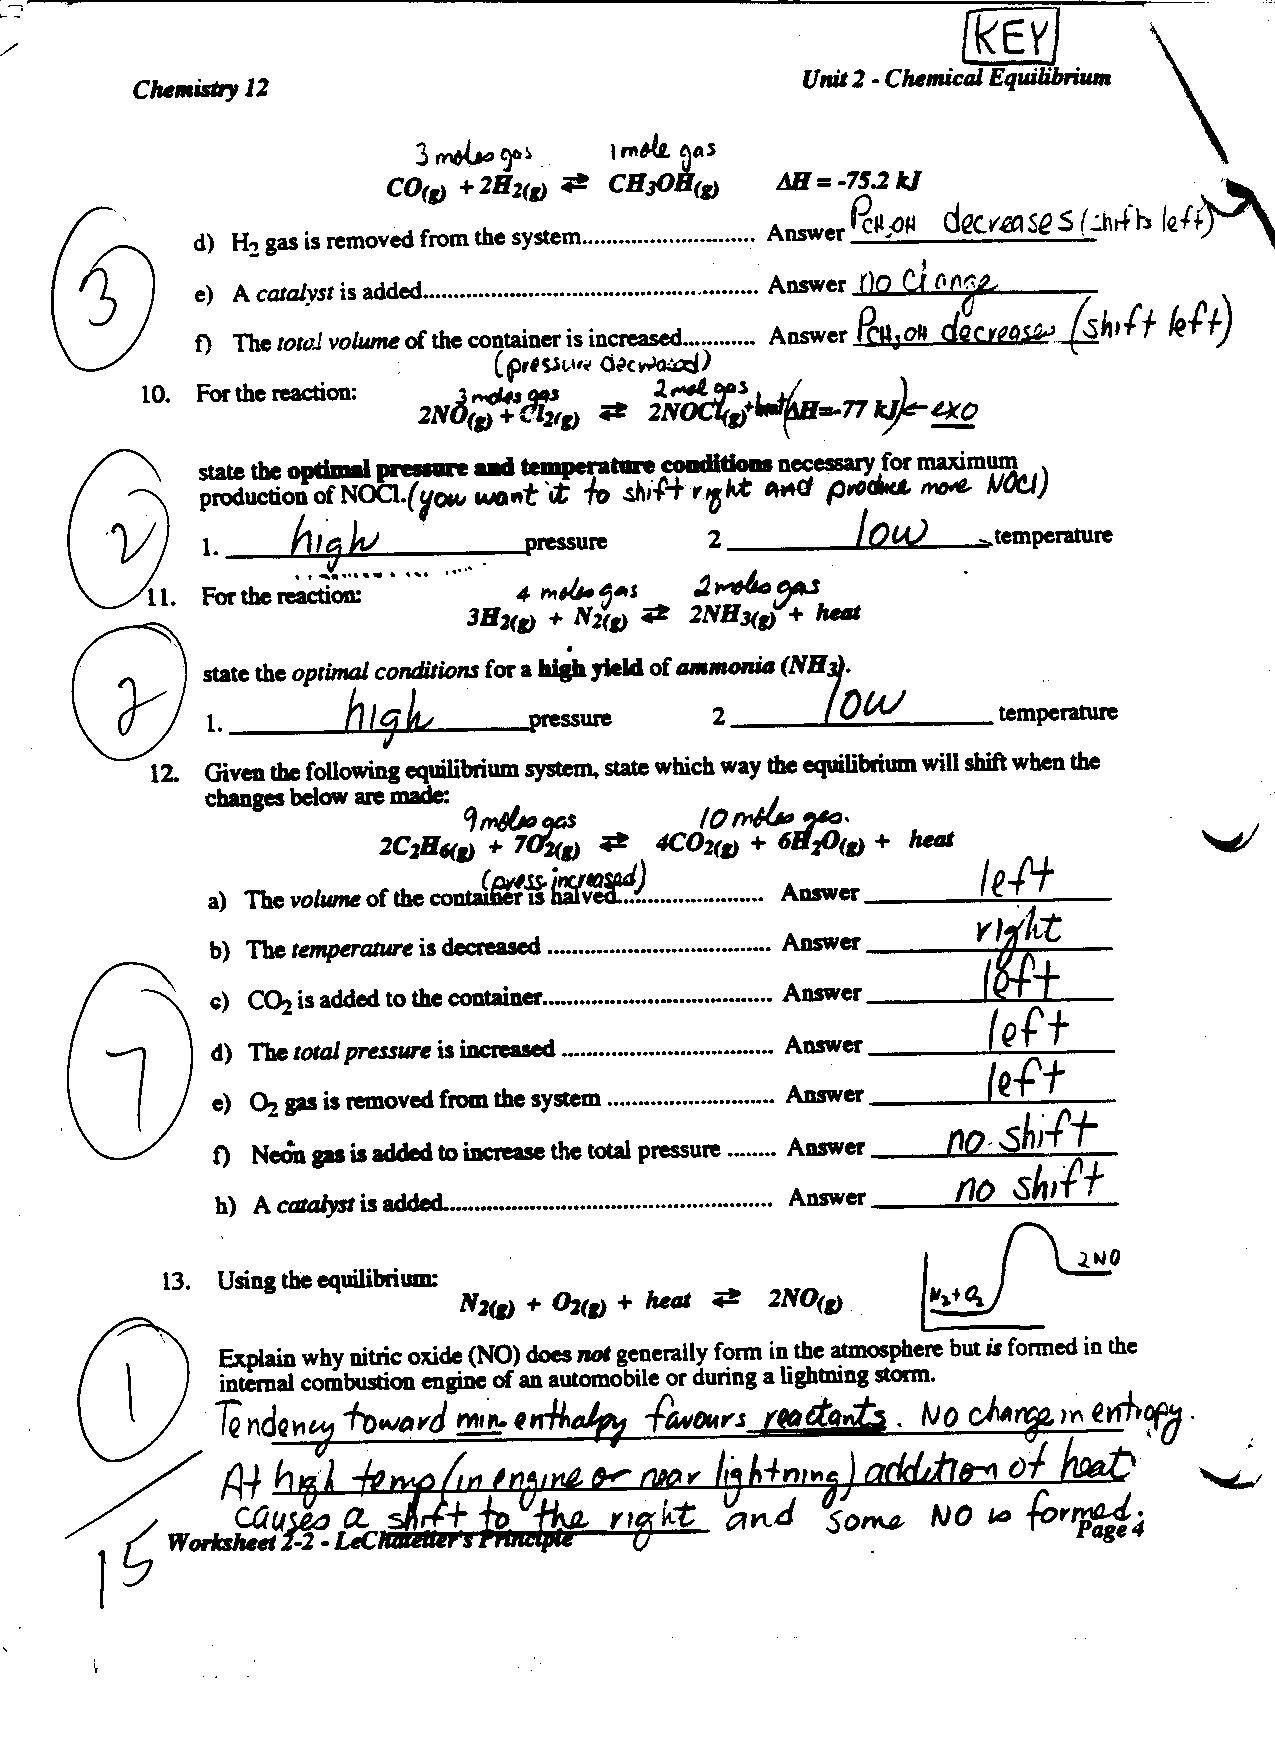 Worksheet For Solubility Curve